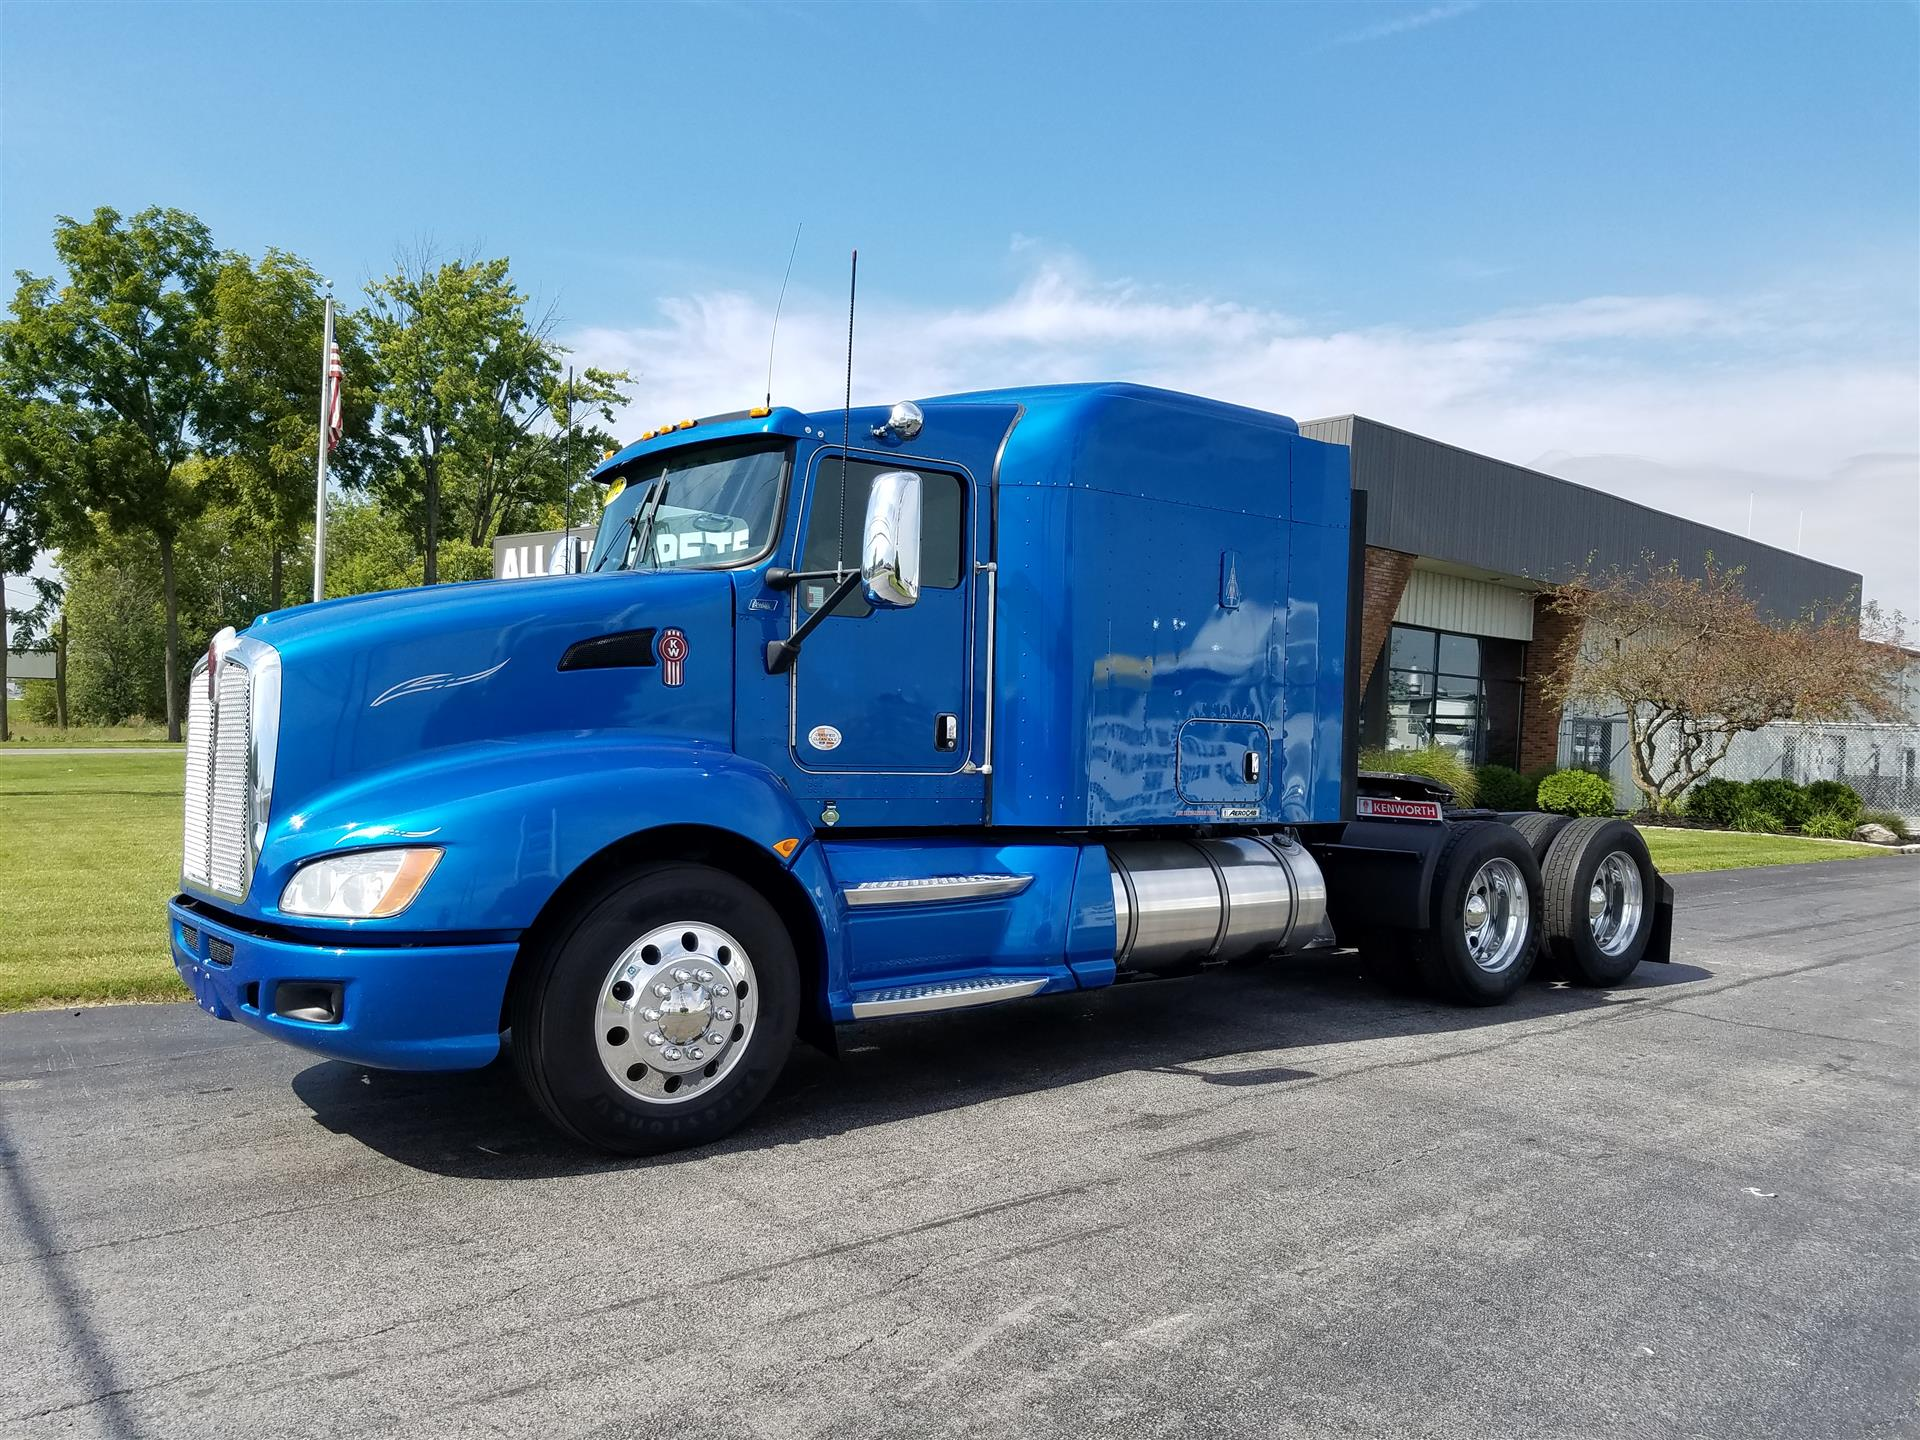 Warner Buick Gmc Dealership In Findlay Ohio Autos Post